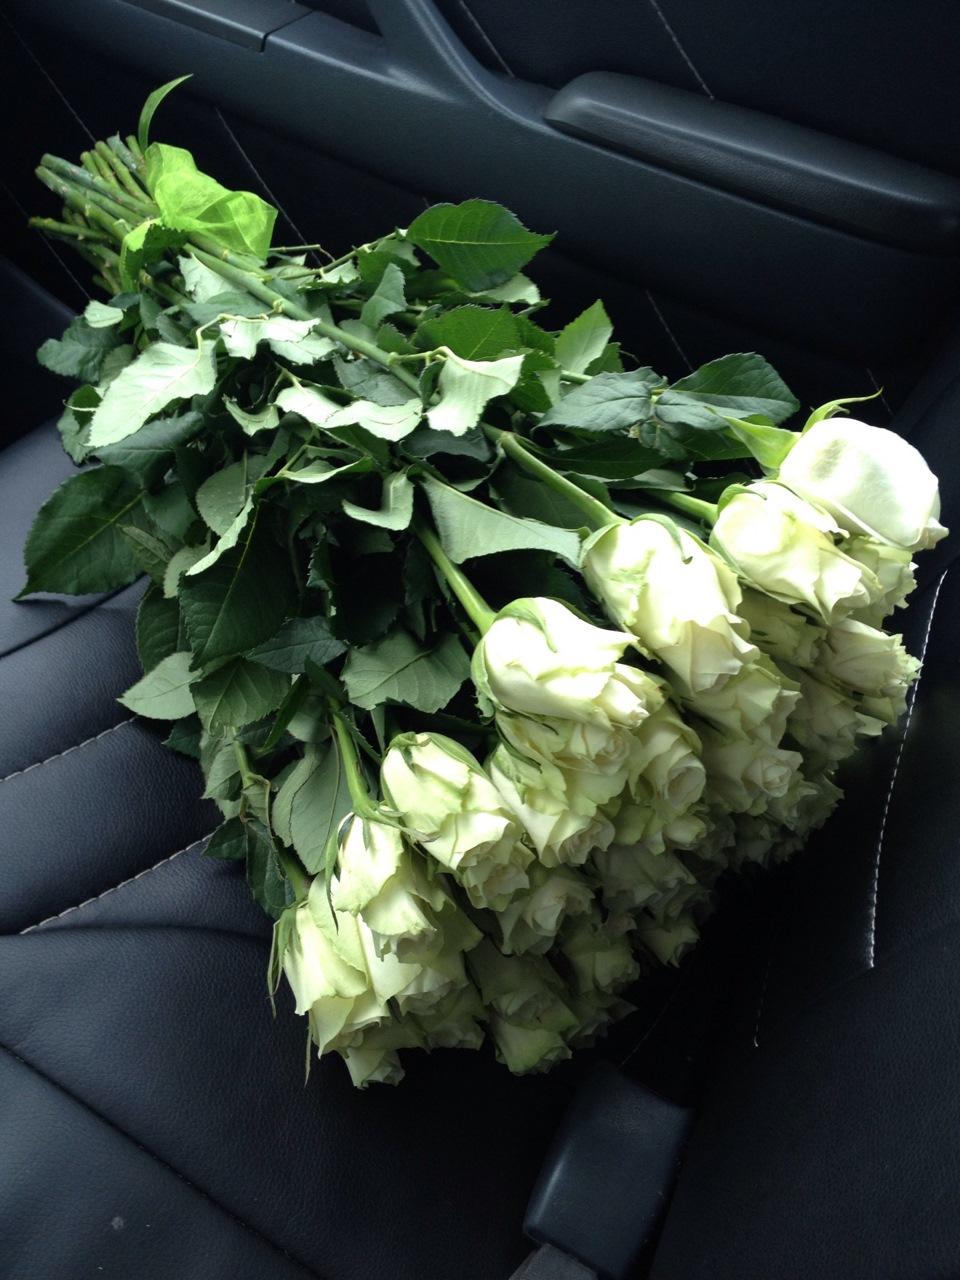 Фото цветов в машине мерседес